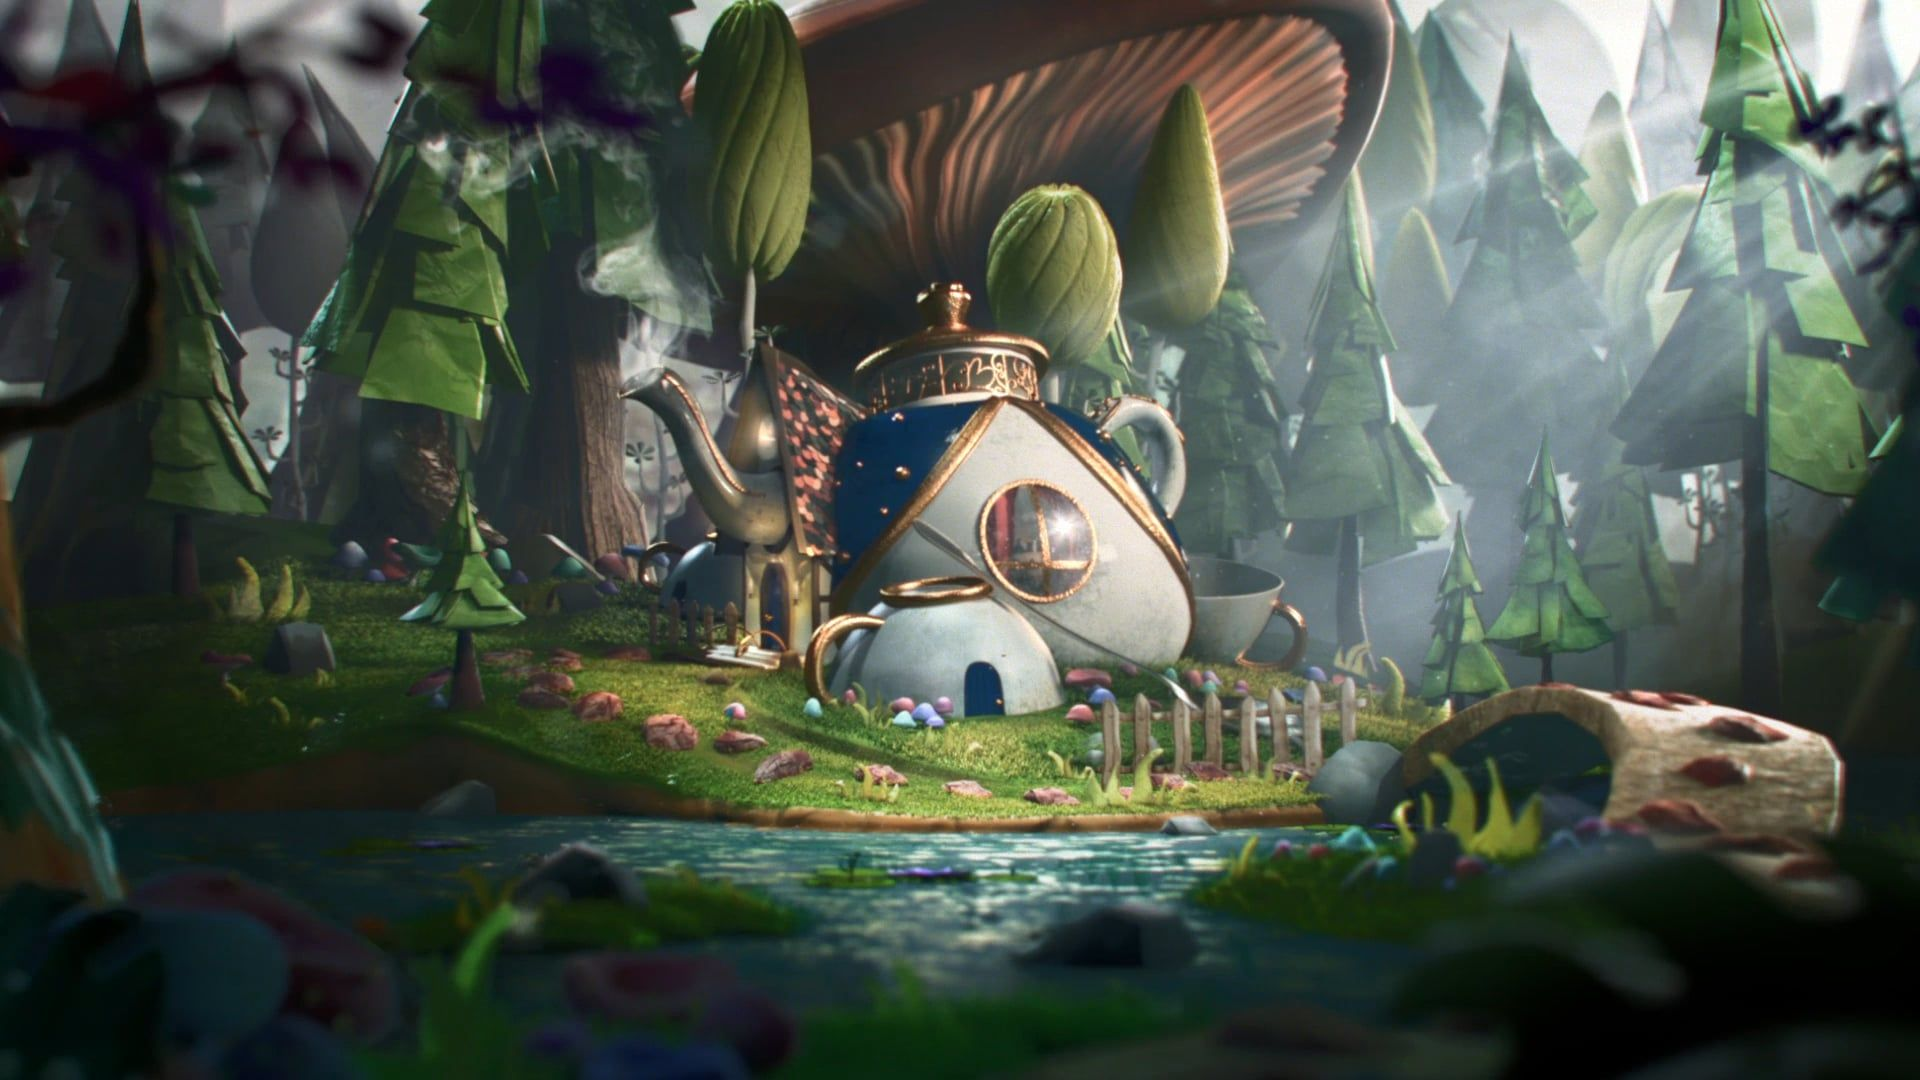 Alice In Wonderland Wallpapers Top Free Alice In Wonderland